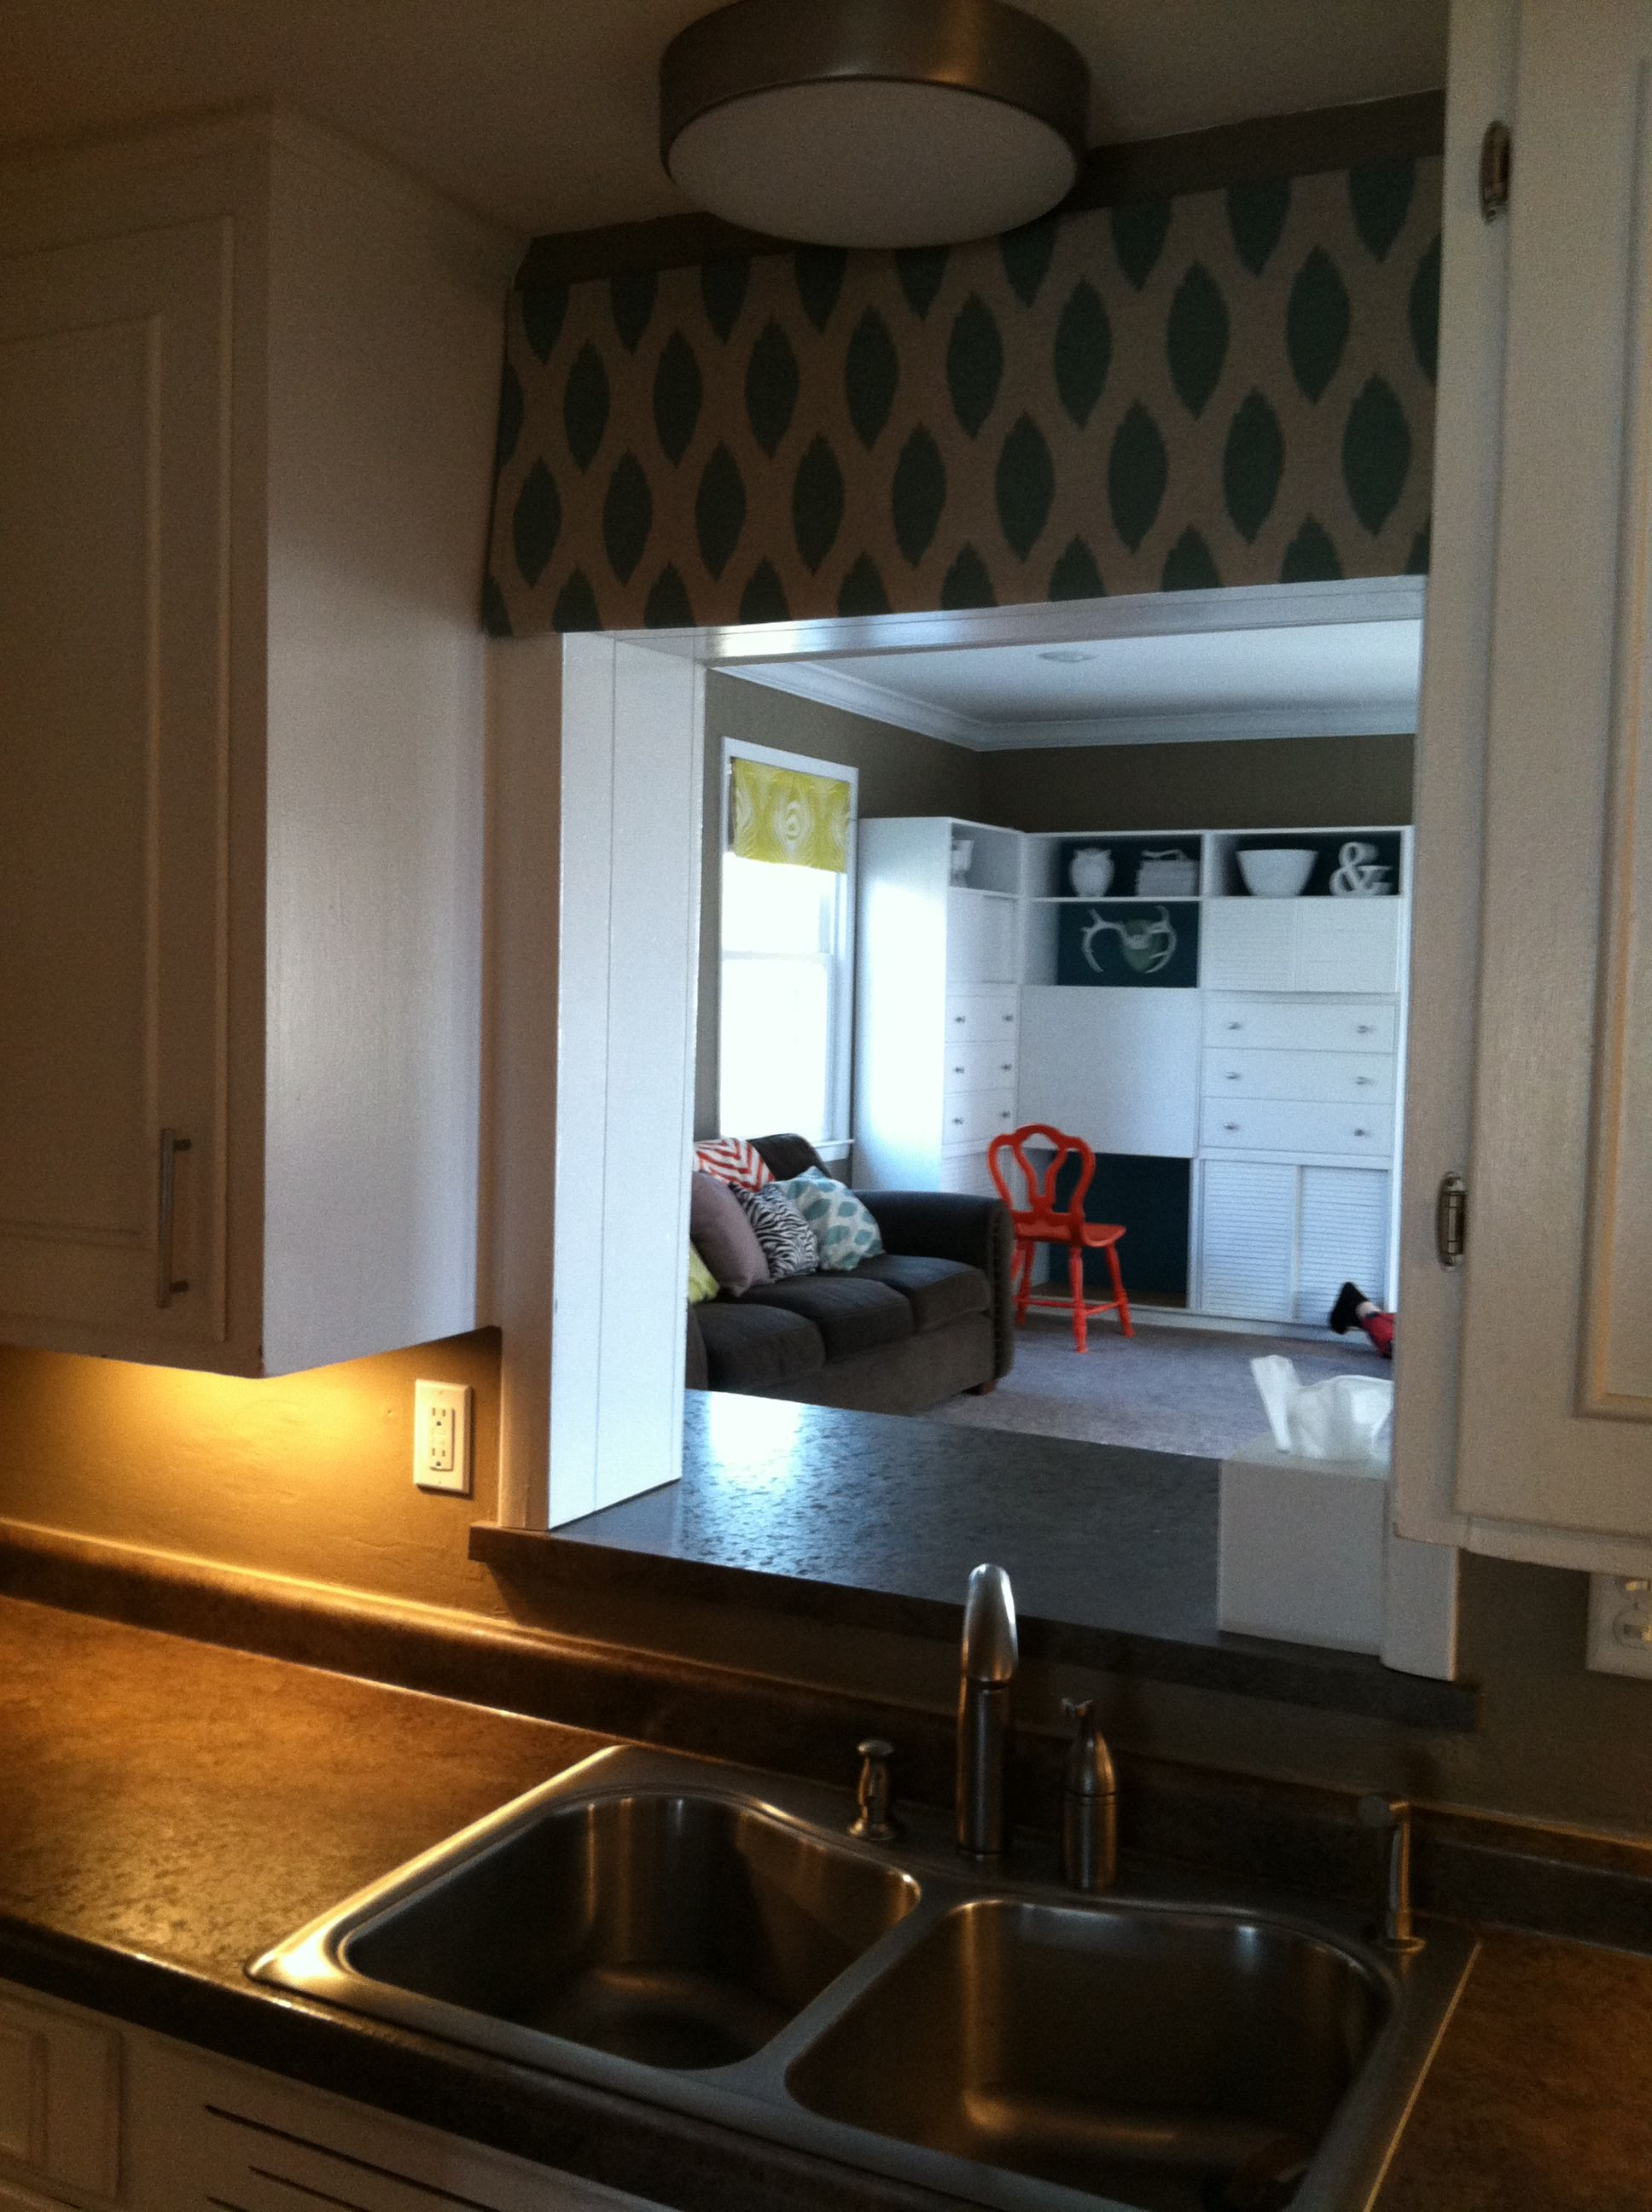 Curtain Above Sink On Pass Through Window Plus Under Cabinet Lighting Kitchen Remodel Pass Through Window